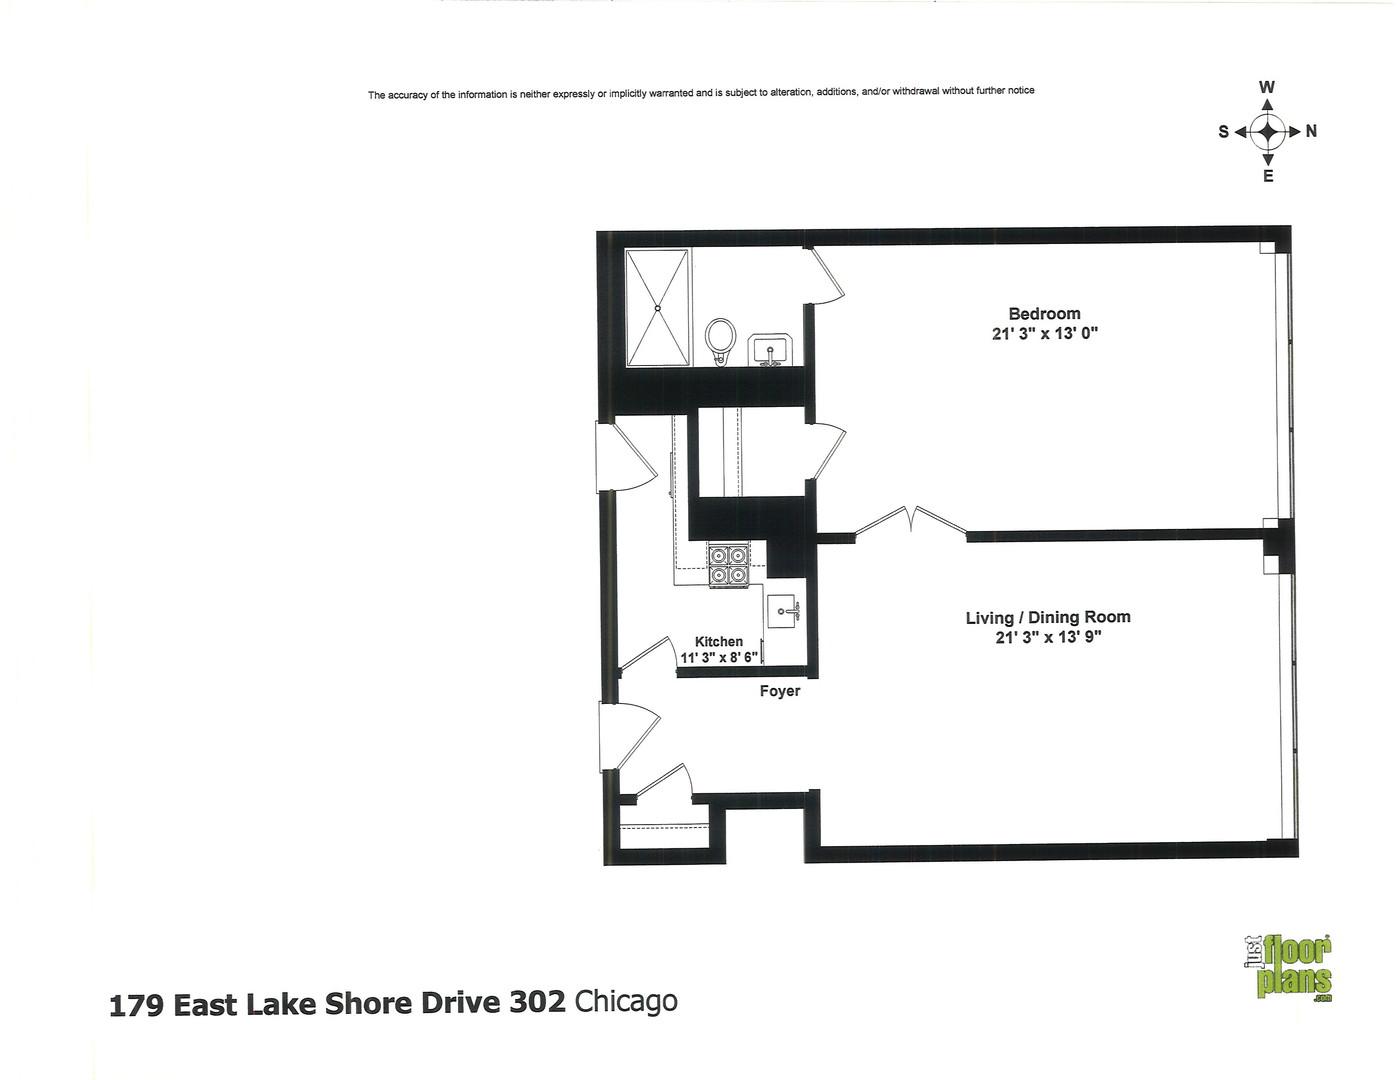 179 East LAKE SHORE 302, CHICAGO, Illinois, 60611